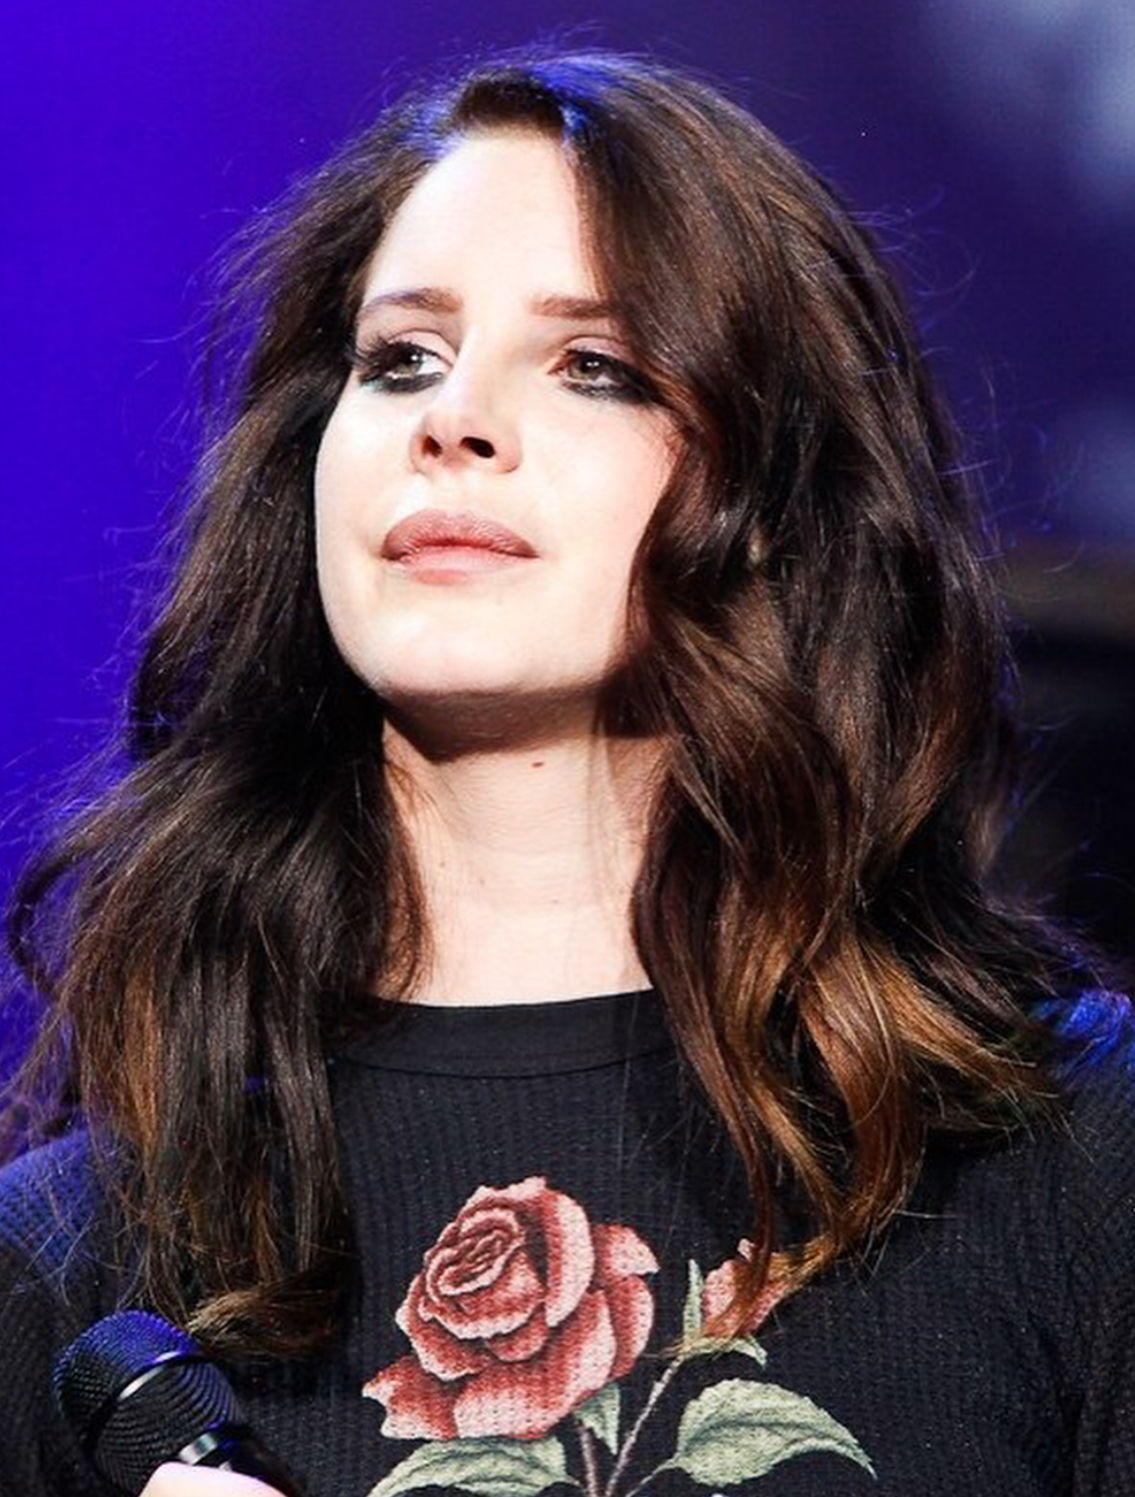 Lana Del Rey Medium Length Hair And Curls Hair Style Medium Hair Styles Retro Curls Hair Inspiration Color